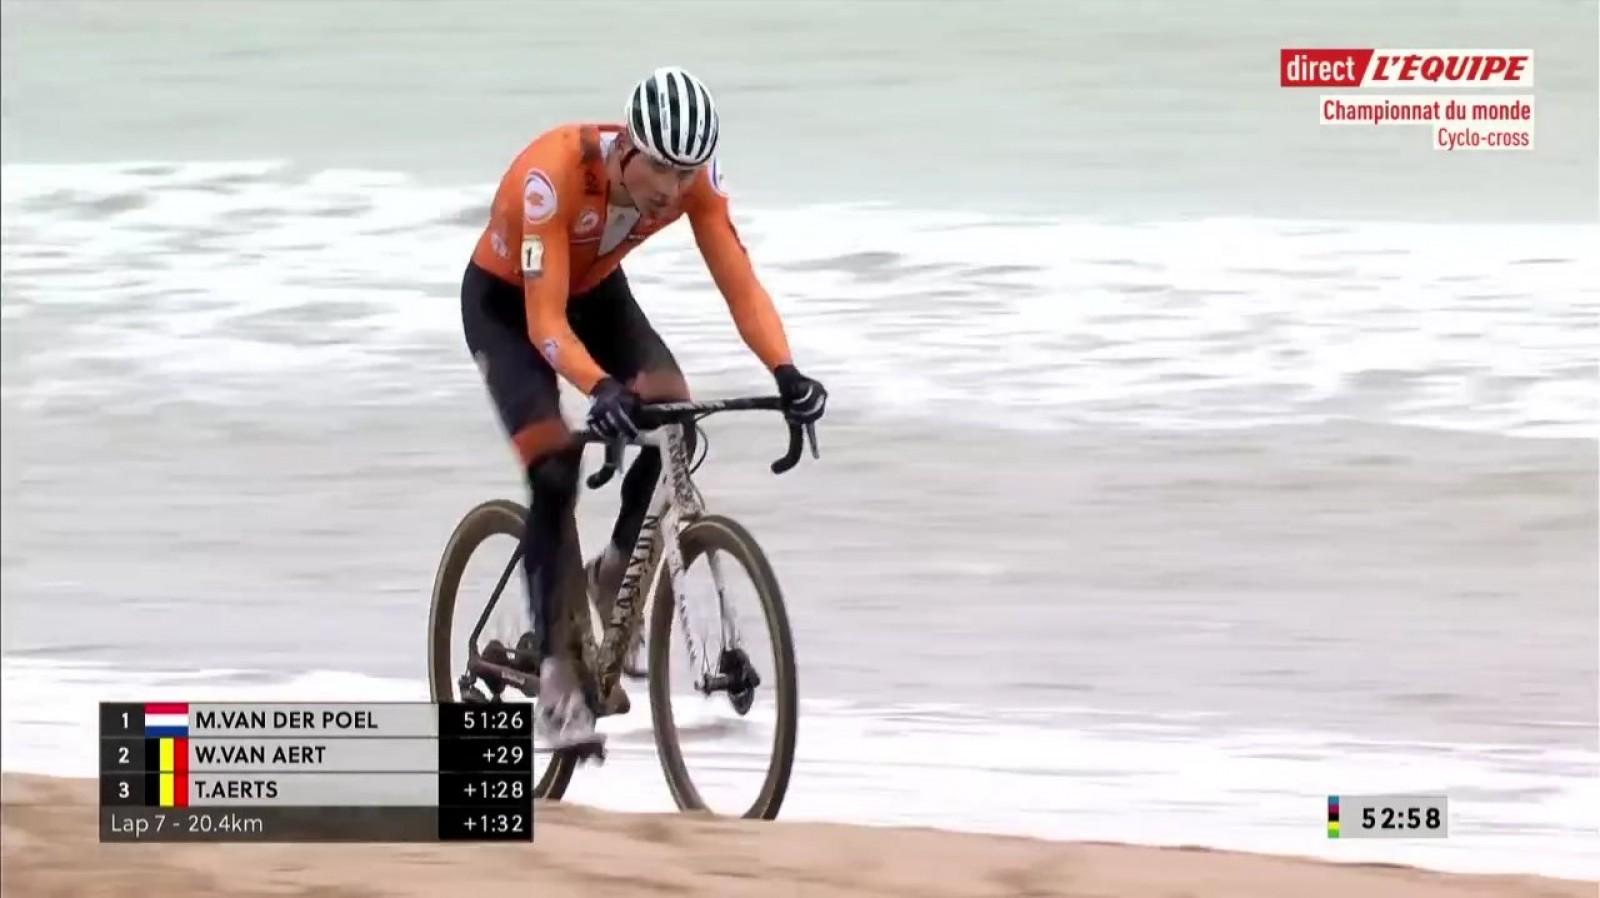 van-der-poel-campeon-mundo-ciclocross-2021/